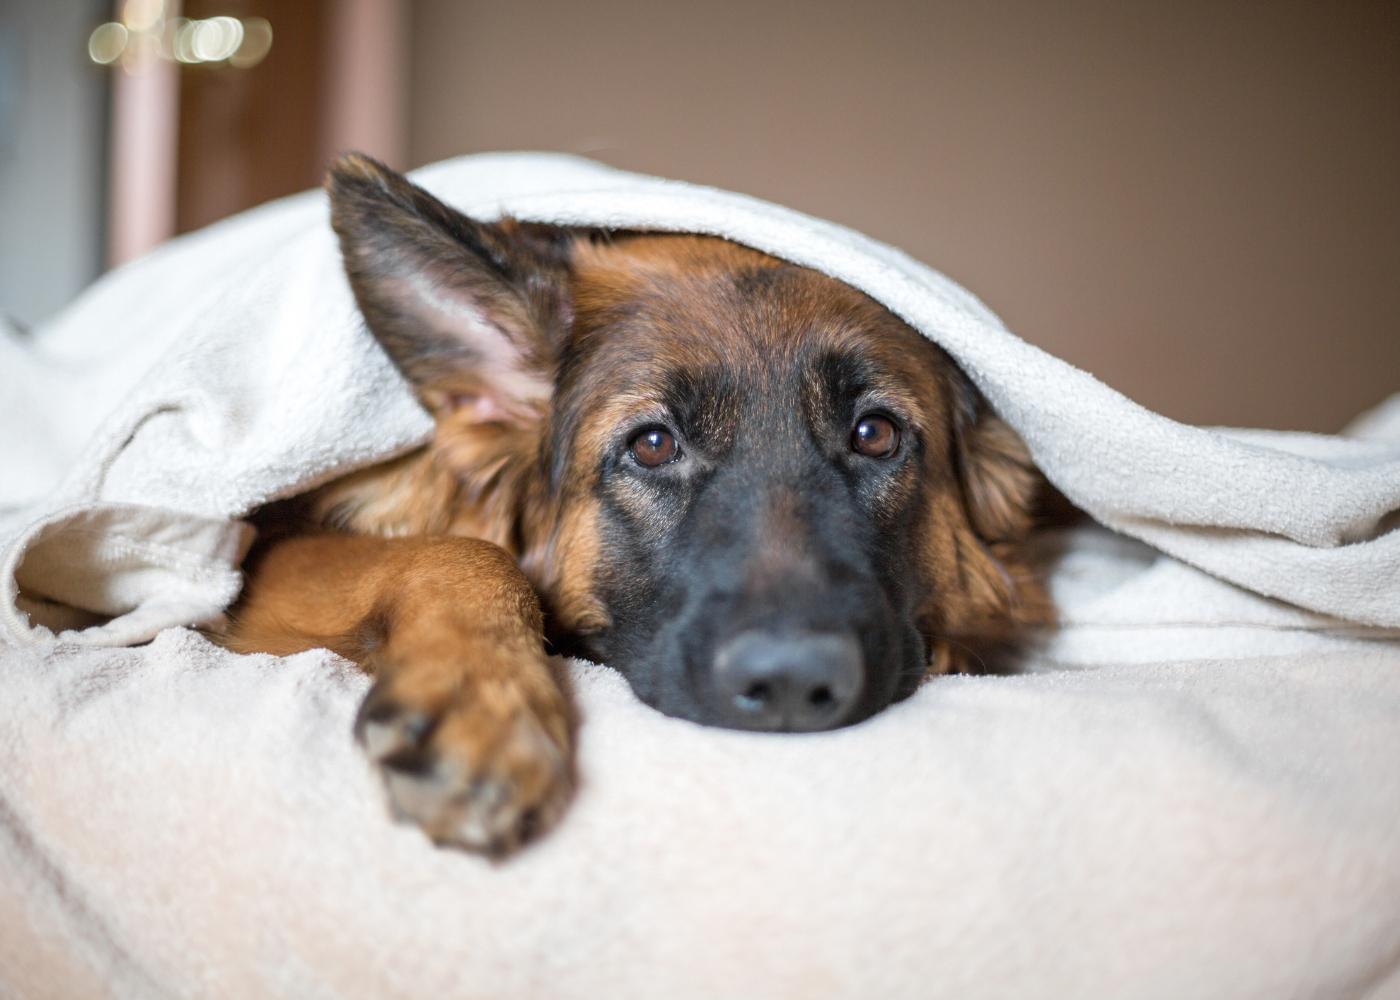 febre nos animais sinais